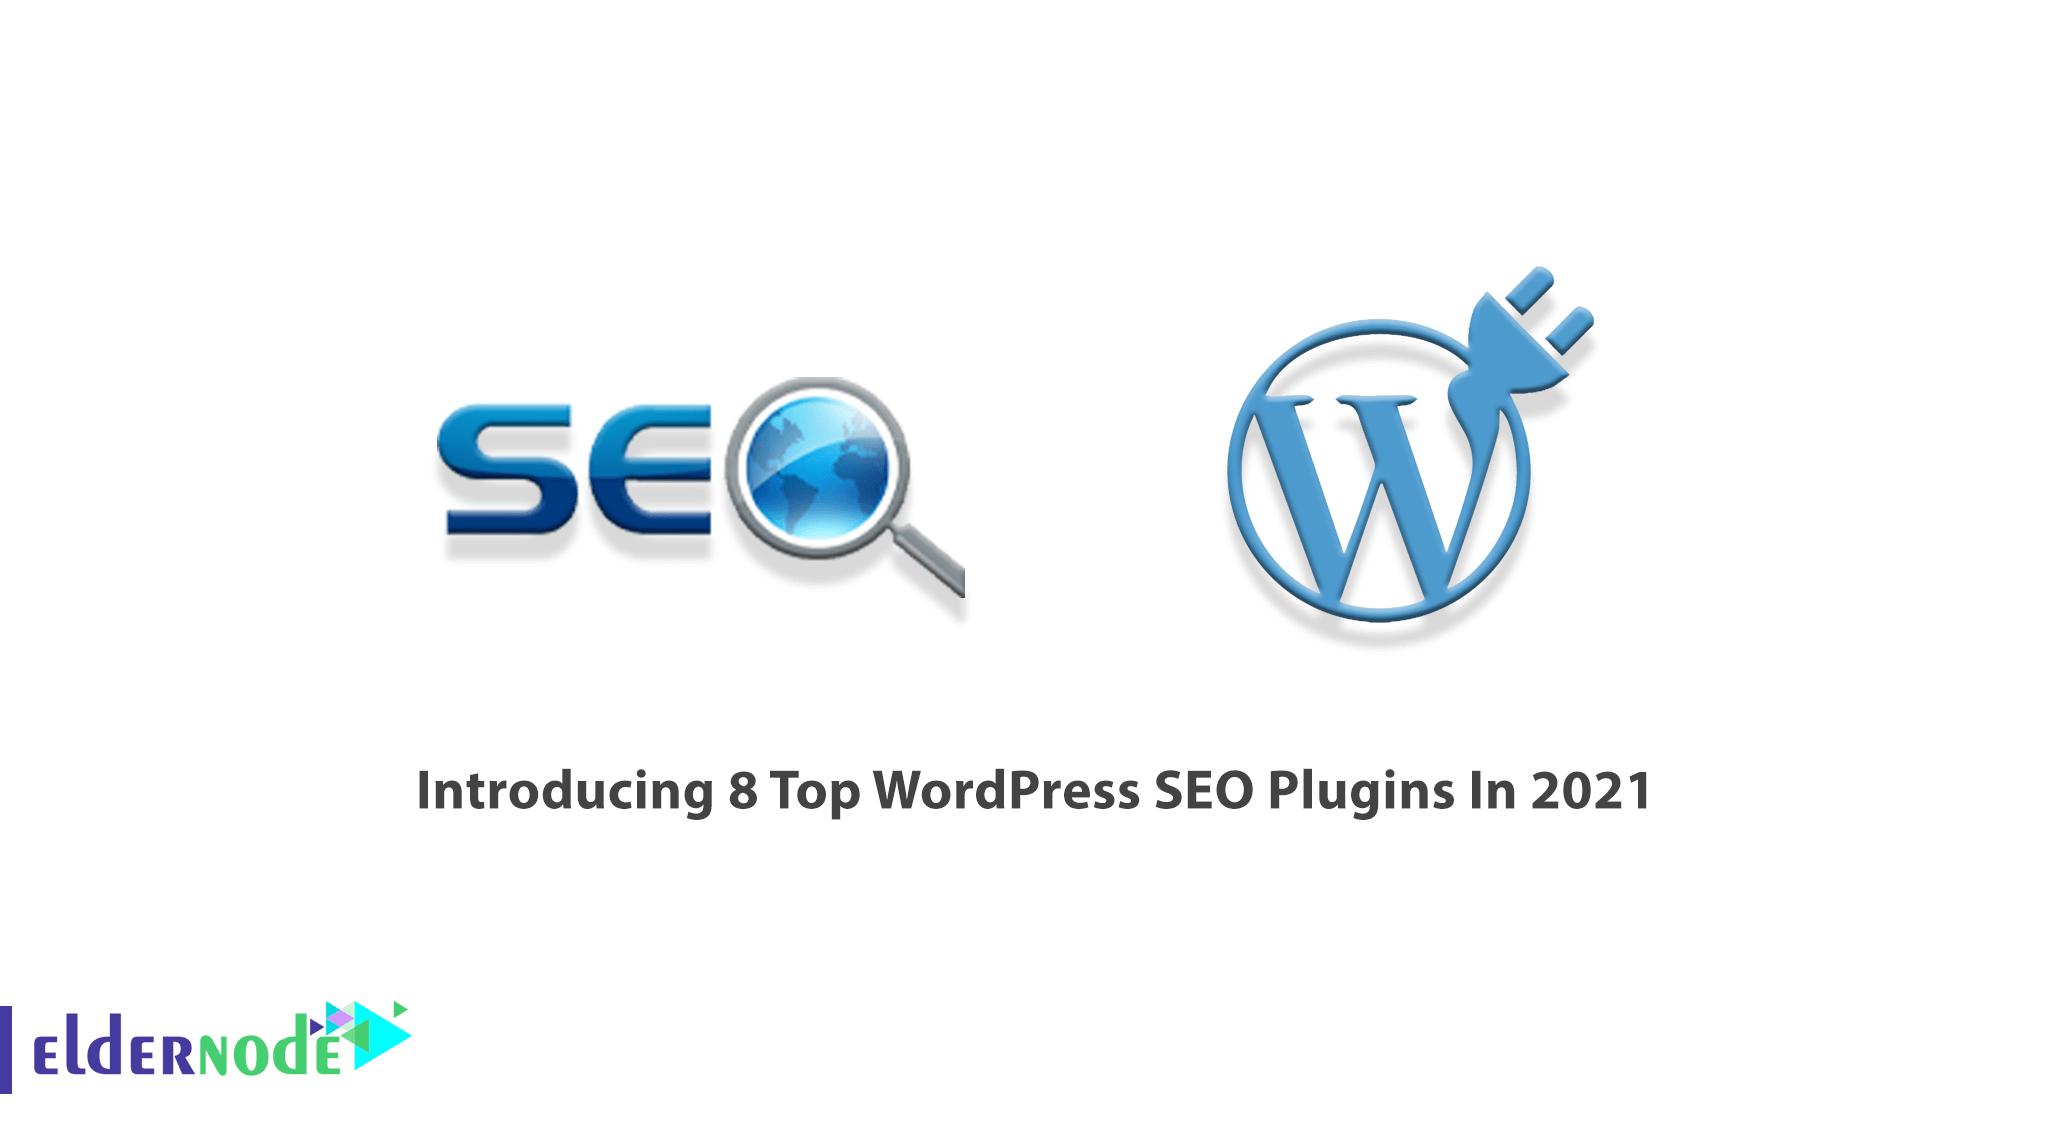 Introducing 8 Top WordPress SEO Plugins In 2021